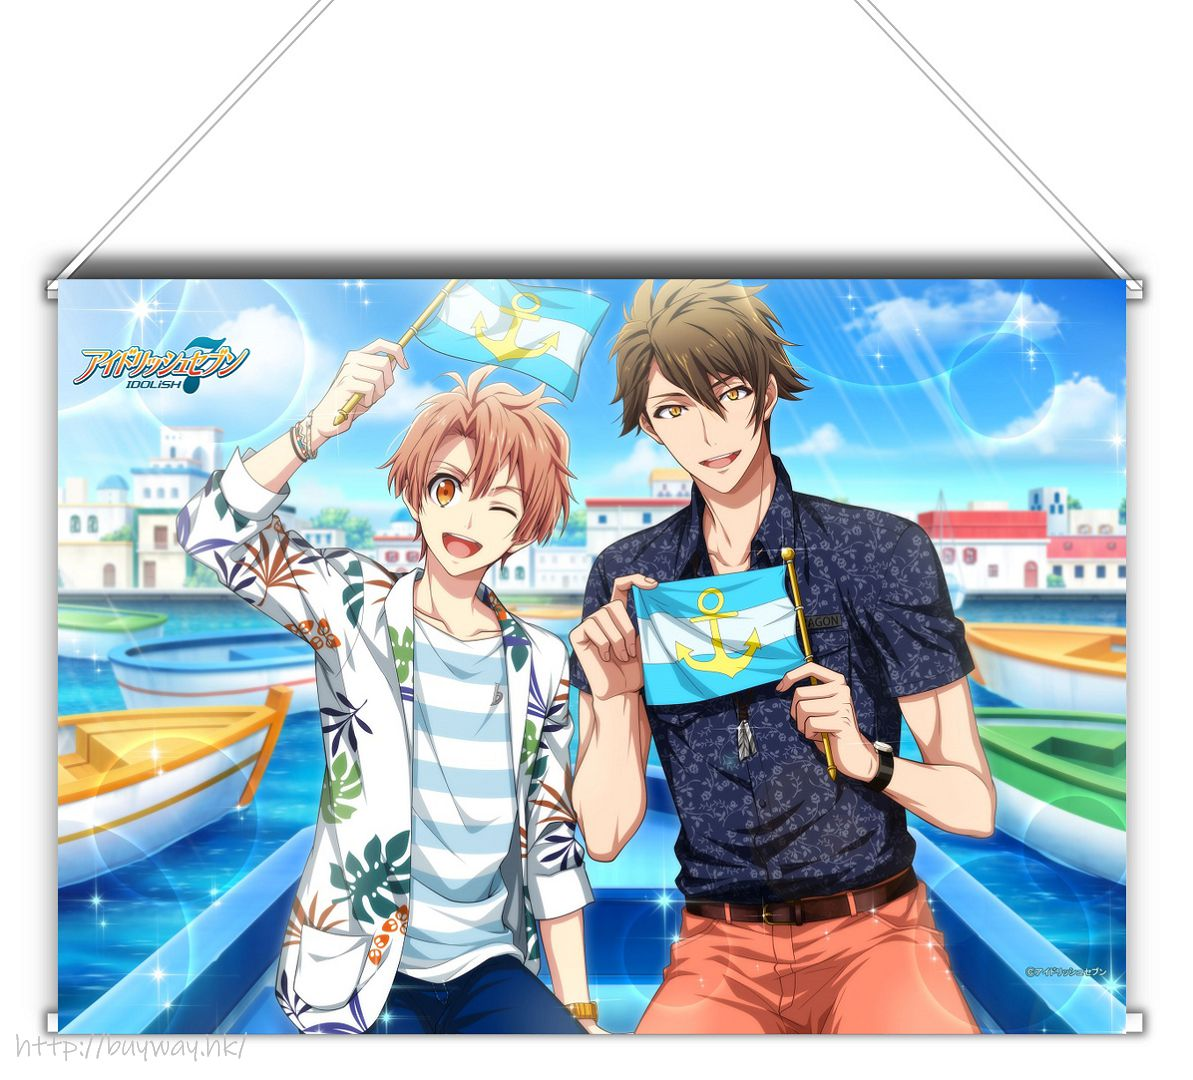 IDOLiSH7 「和泉三月 + 十龍之介」Shuffle Talk2 B3 掛布 Shuffle Talk 2 B3 Tapestry Mitsuki & Ryunosuke【IDOLiSH7】